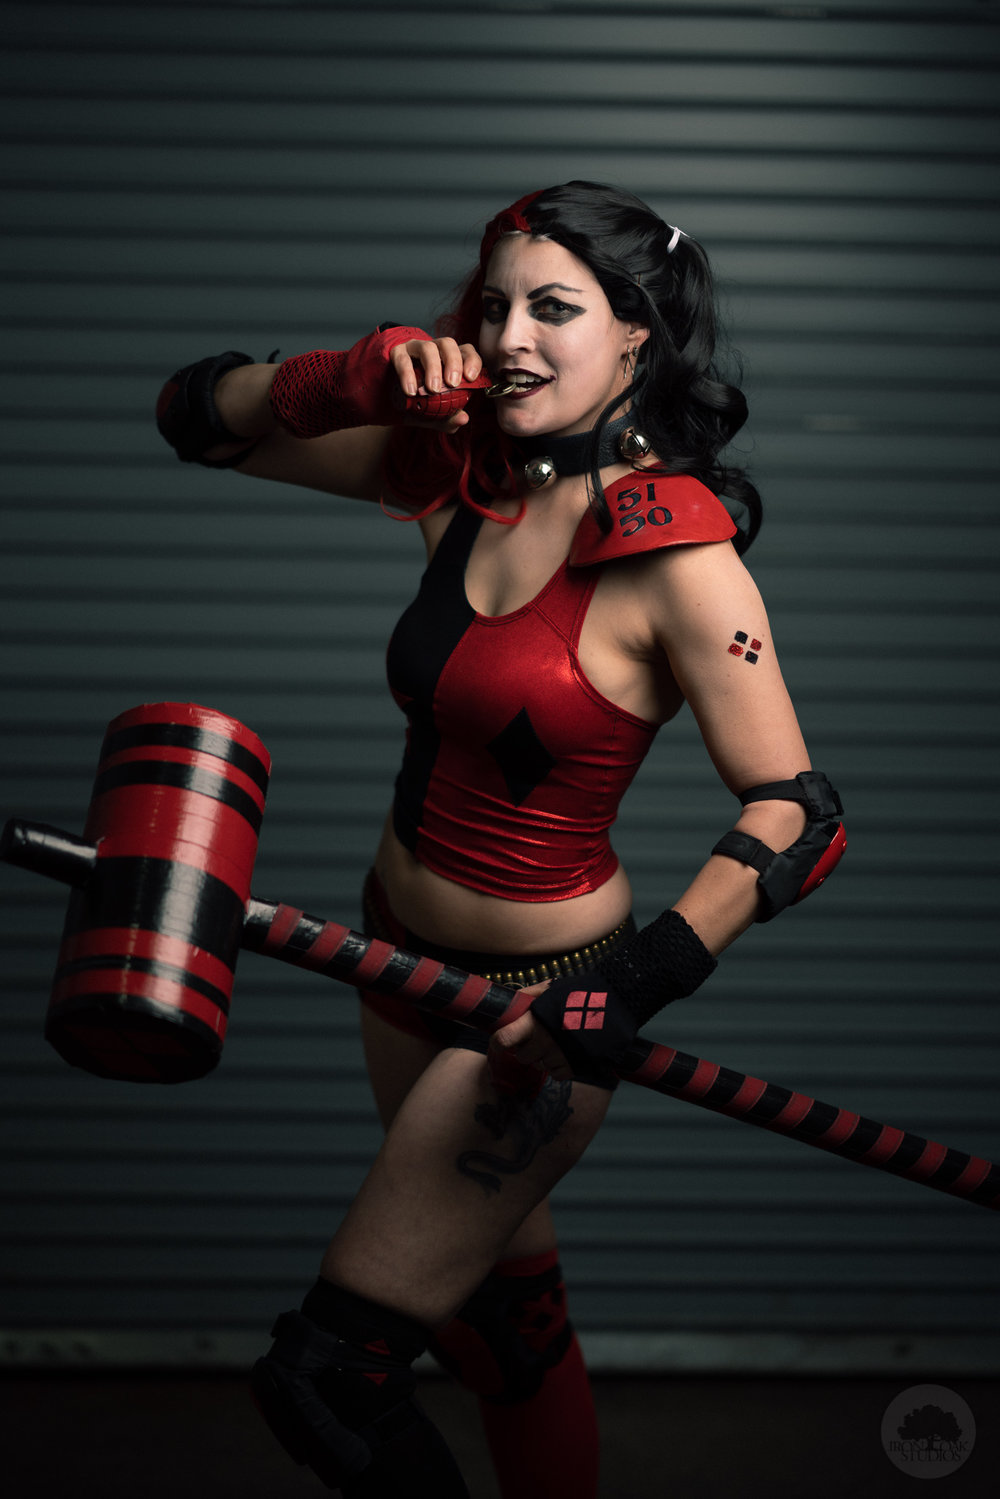 IronOakStudios_Phila_ComicCon_HarleyQuinn_Cosplay-3.jpg